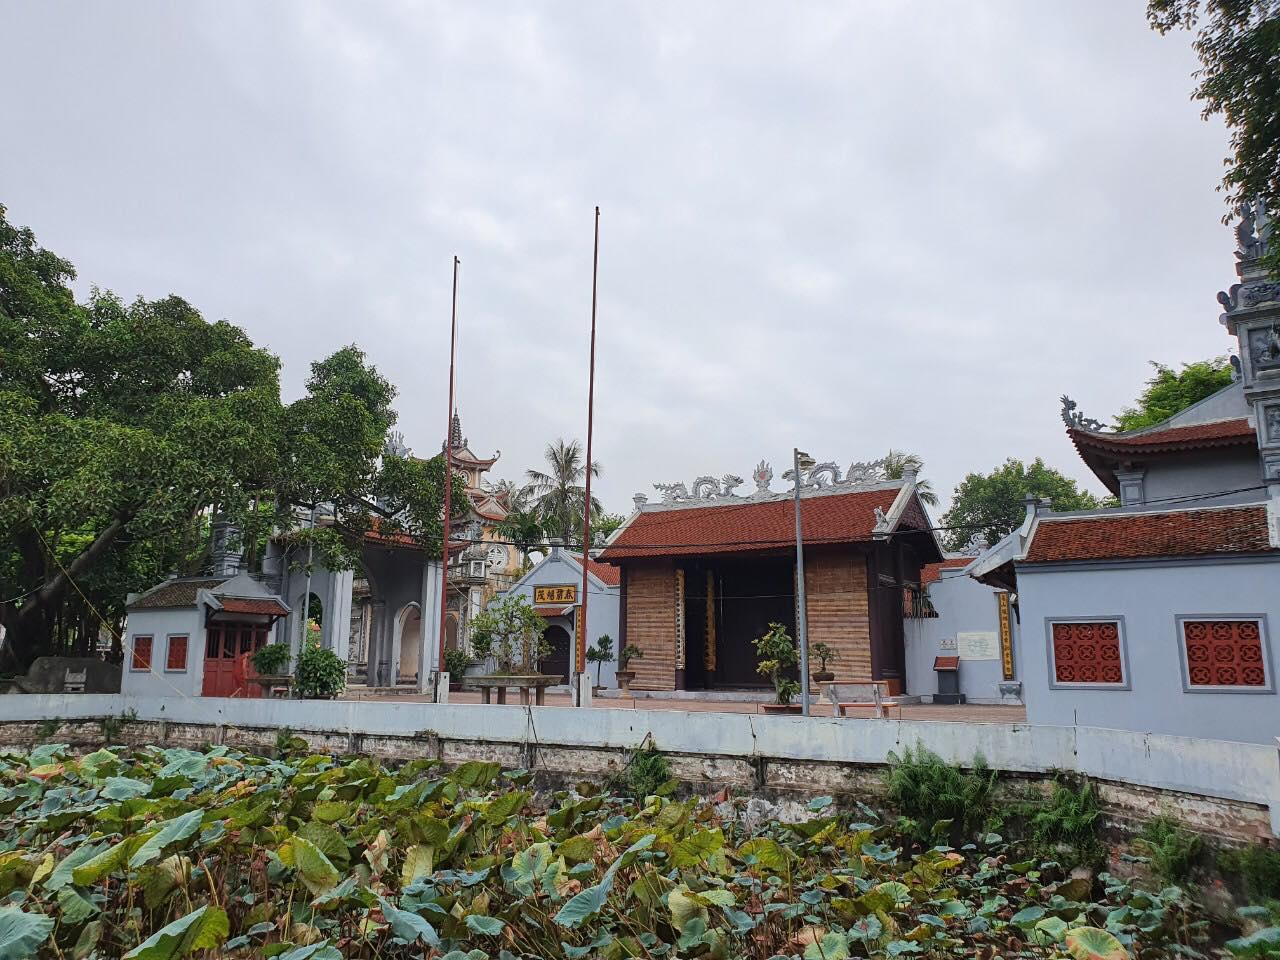 Traces of Cham Culture in Hanoi - Phú Gia Village